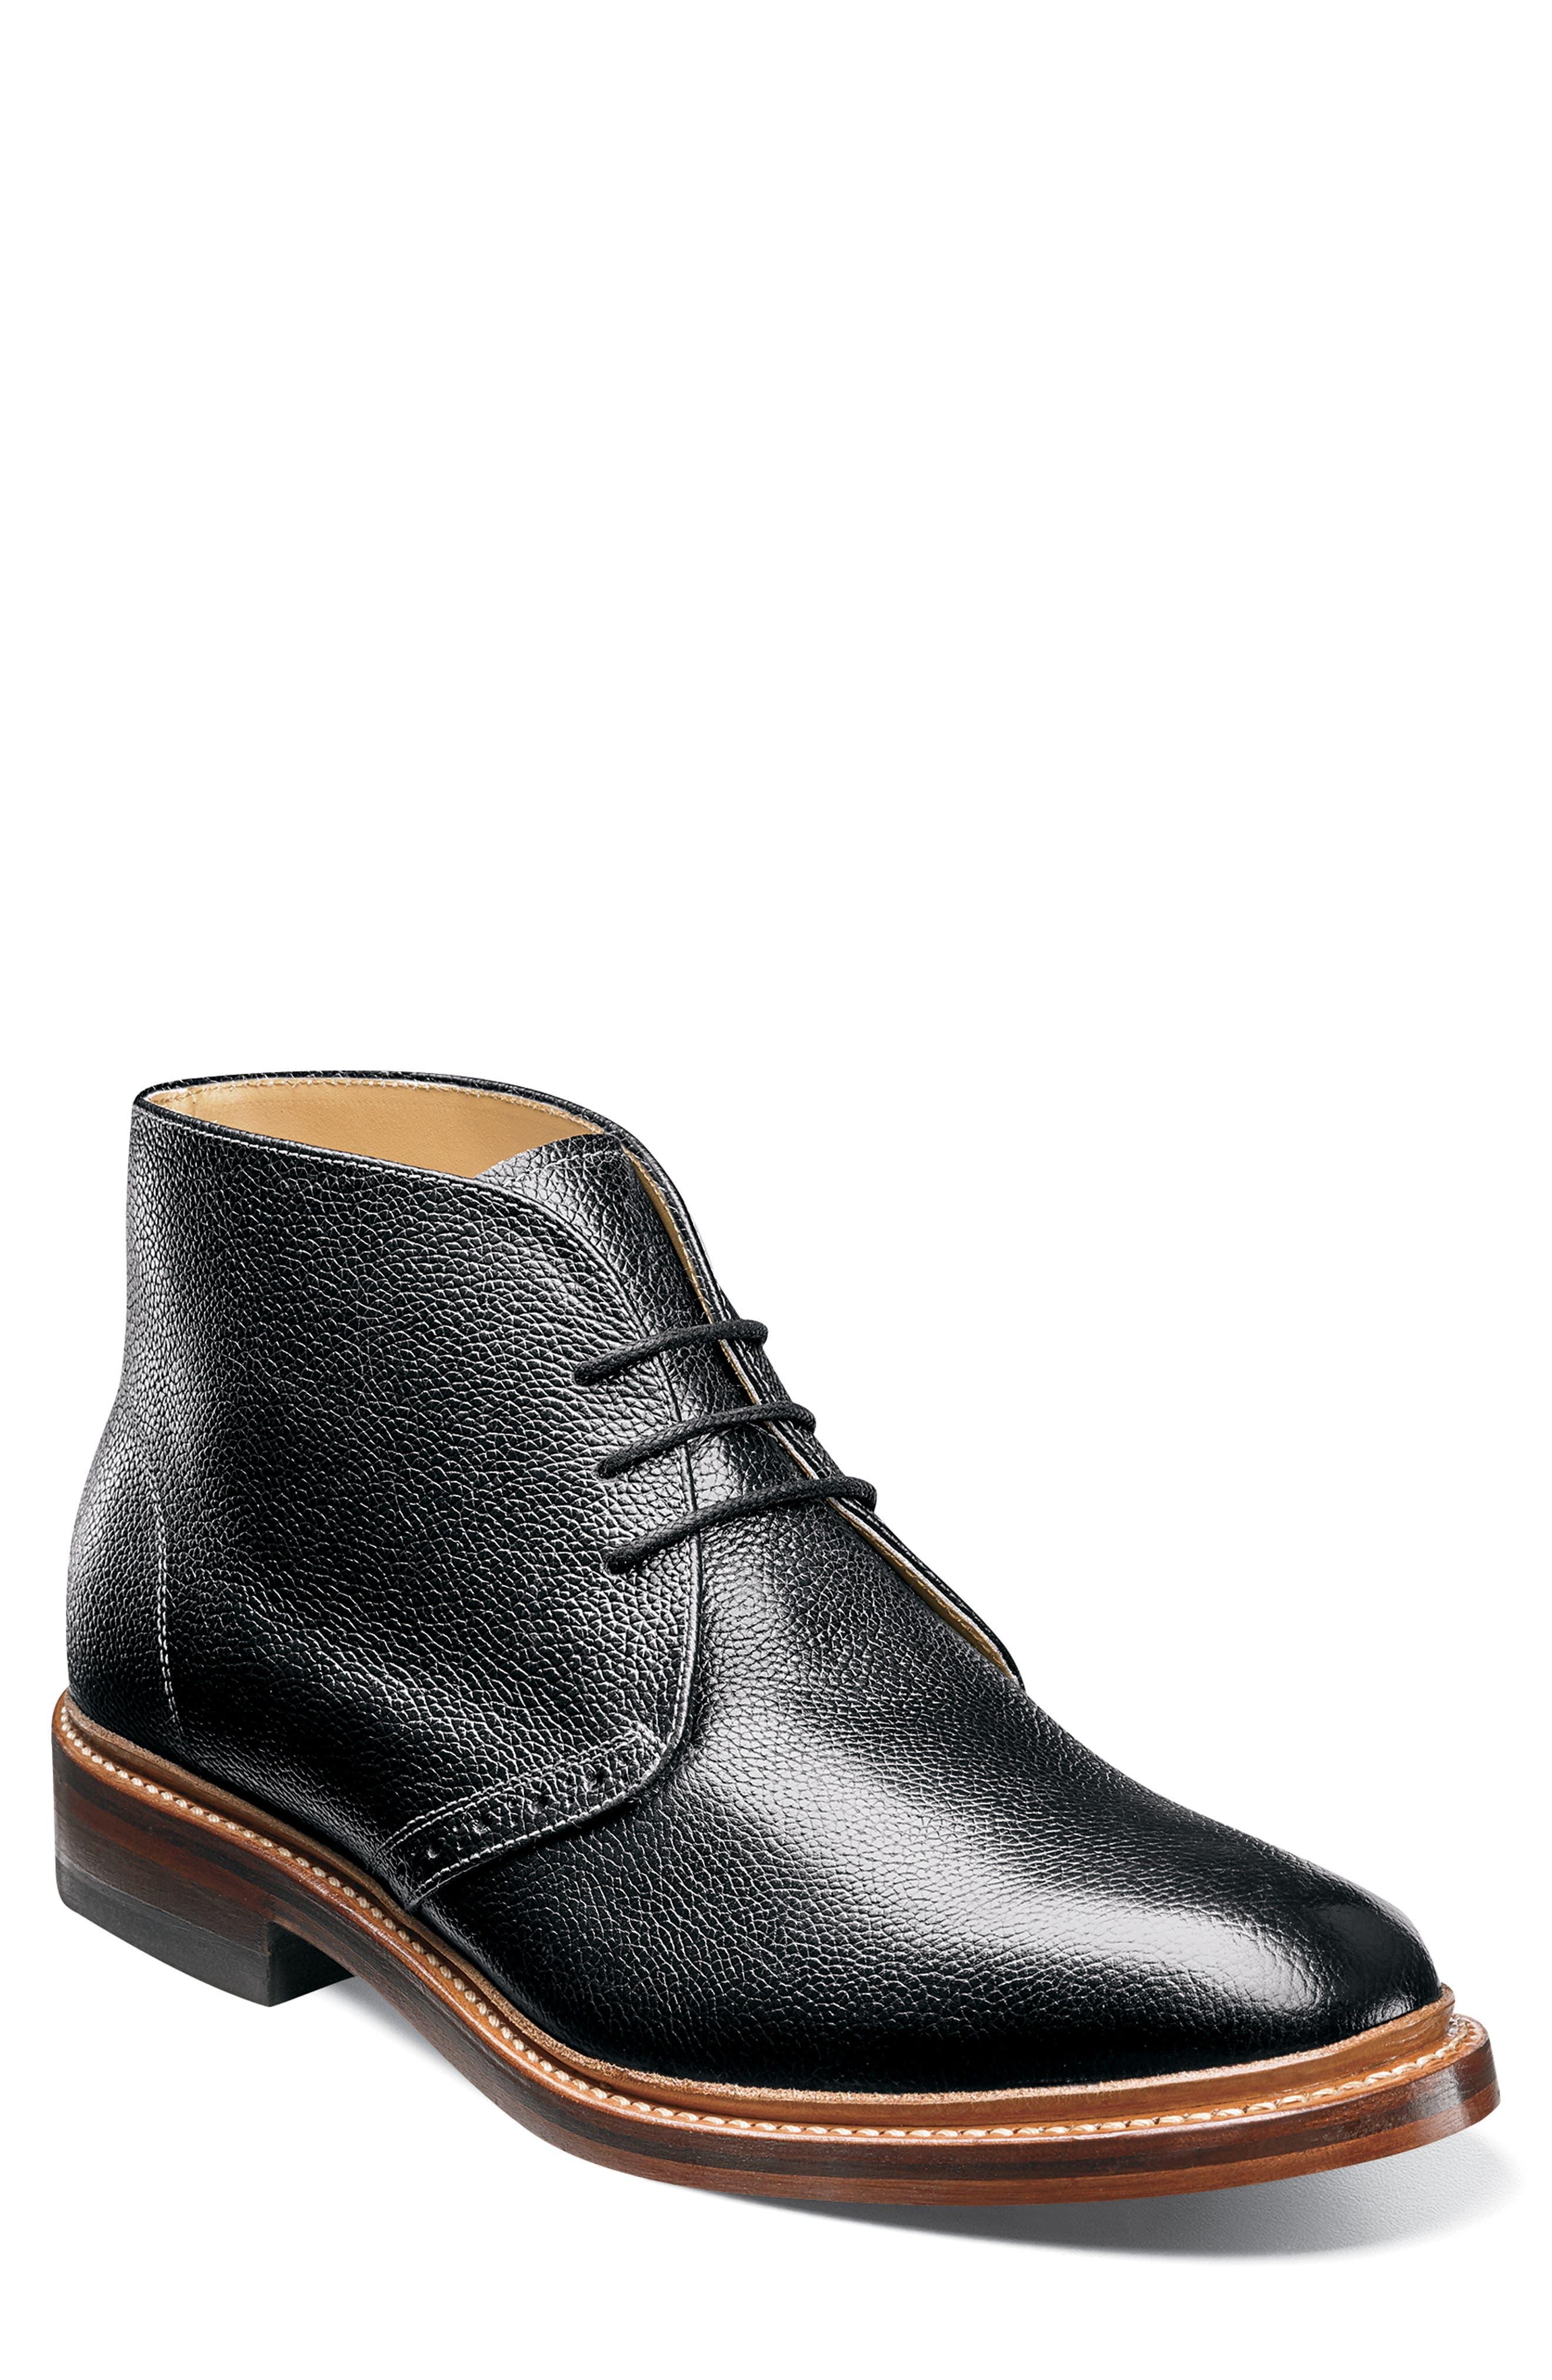 'Madison II' Chukka Boot,                             Alternate thumbnail 3, color,                             001